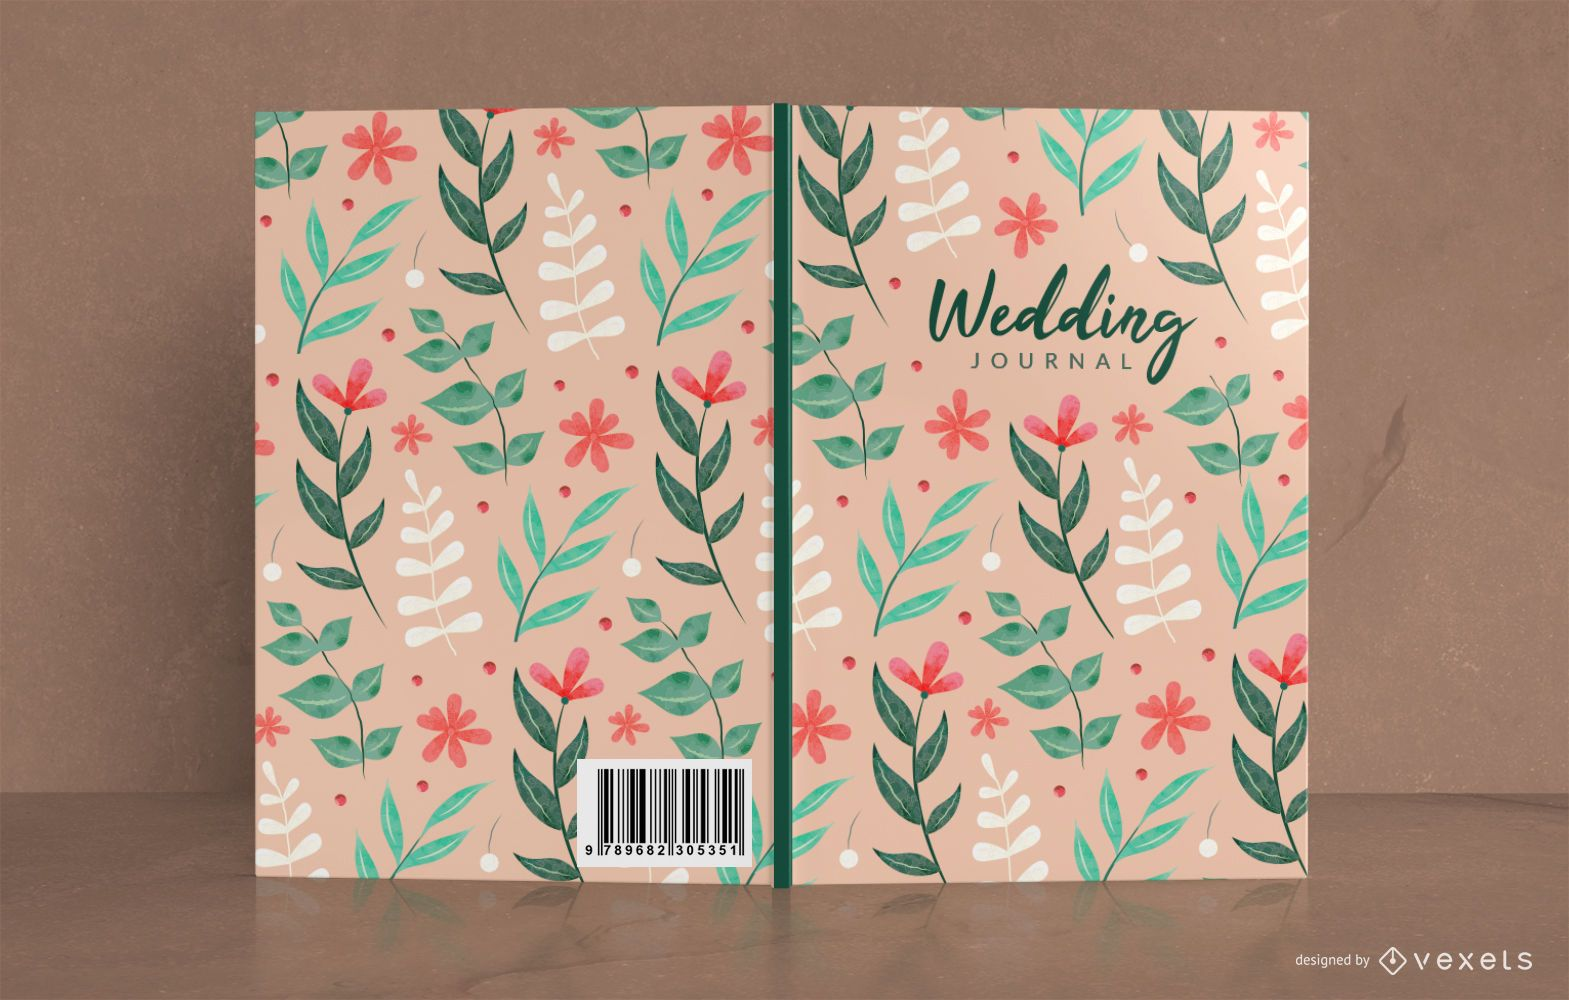 Wedding journal floral book cover design